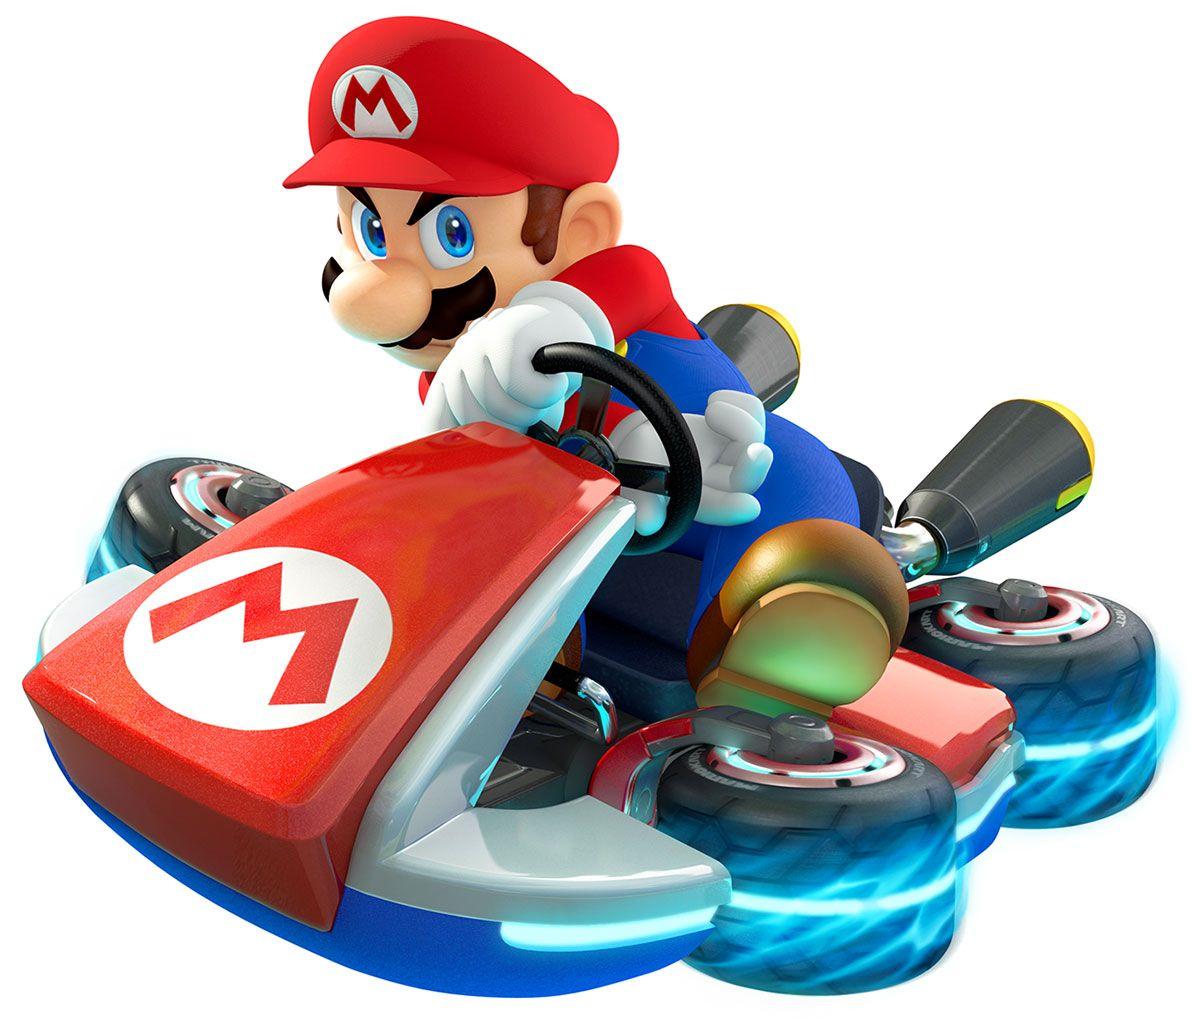 Mario Artwork Characters Art Mario Kart 8 Mario Kart 8 Mario Art Super Smash Bros Characters